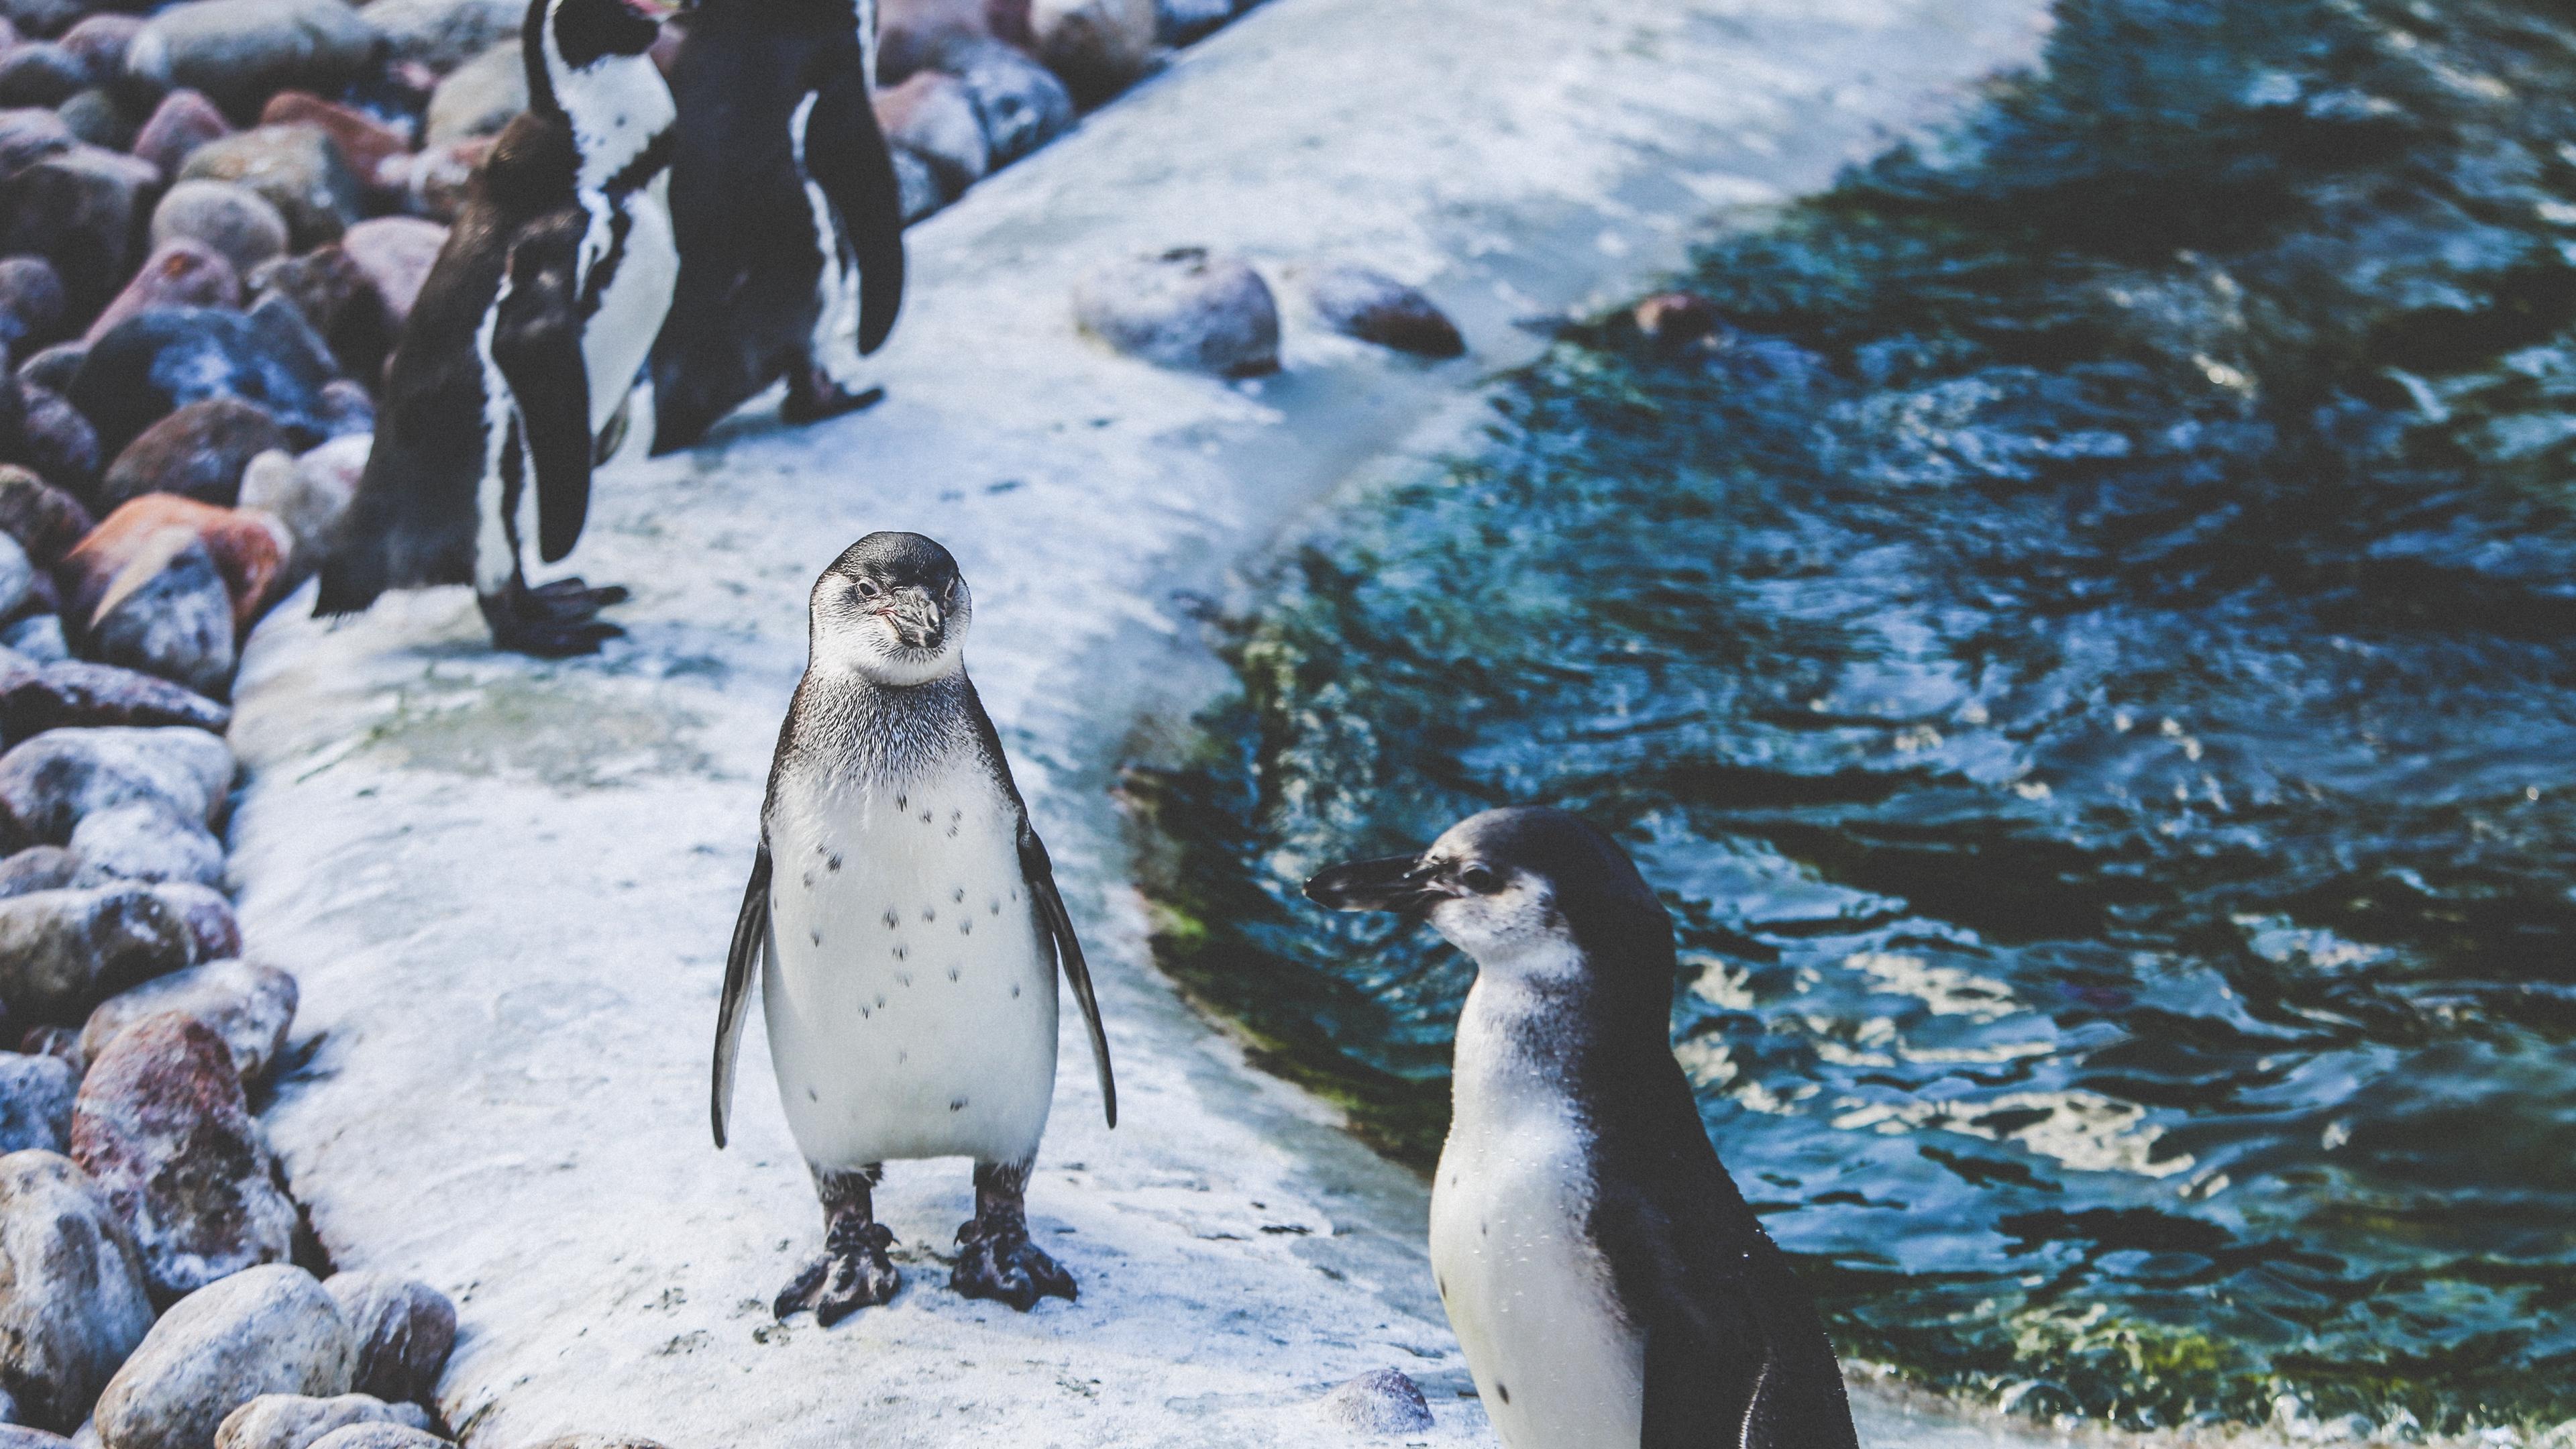 penguins shore birds 4k 1542242613 - penguins, shore, birds 4k - Shore, Penguins, Birds